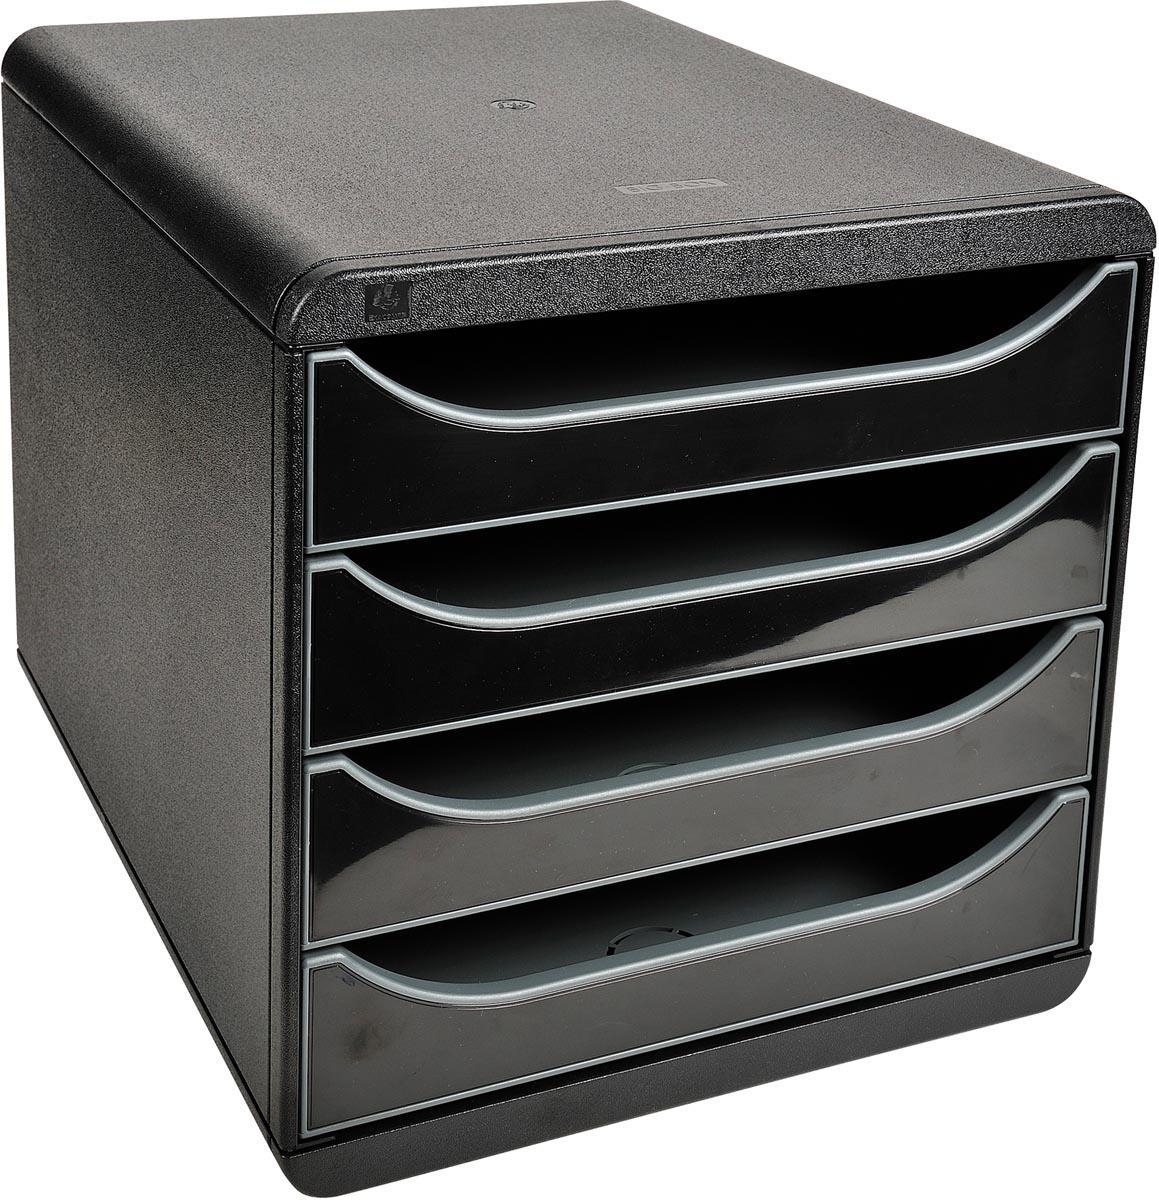 Exacompta ladenblok Big-Box zwart